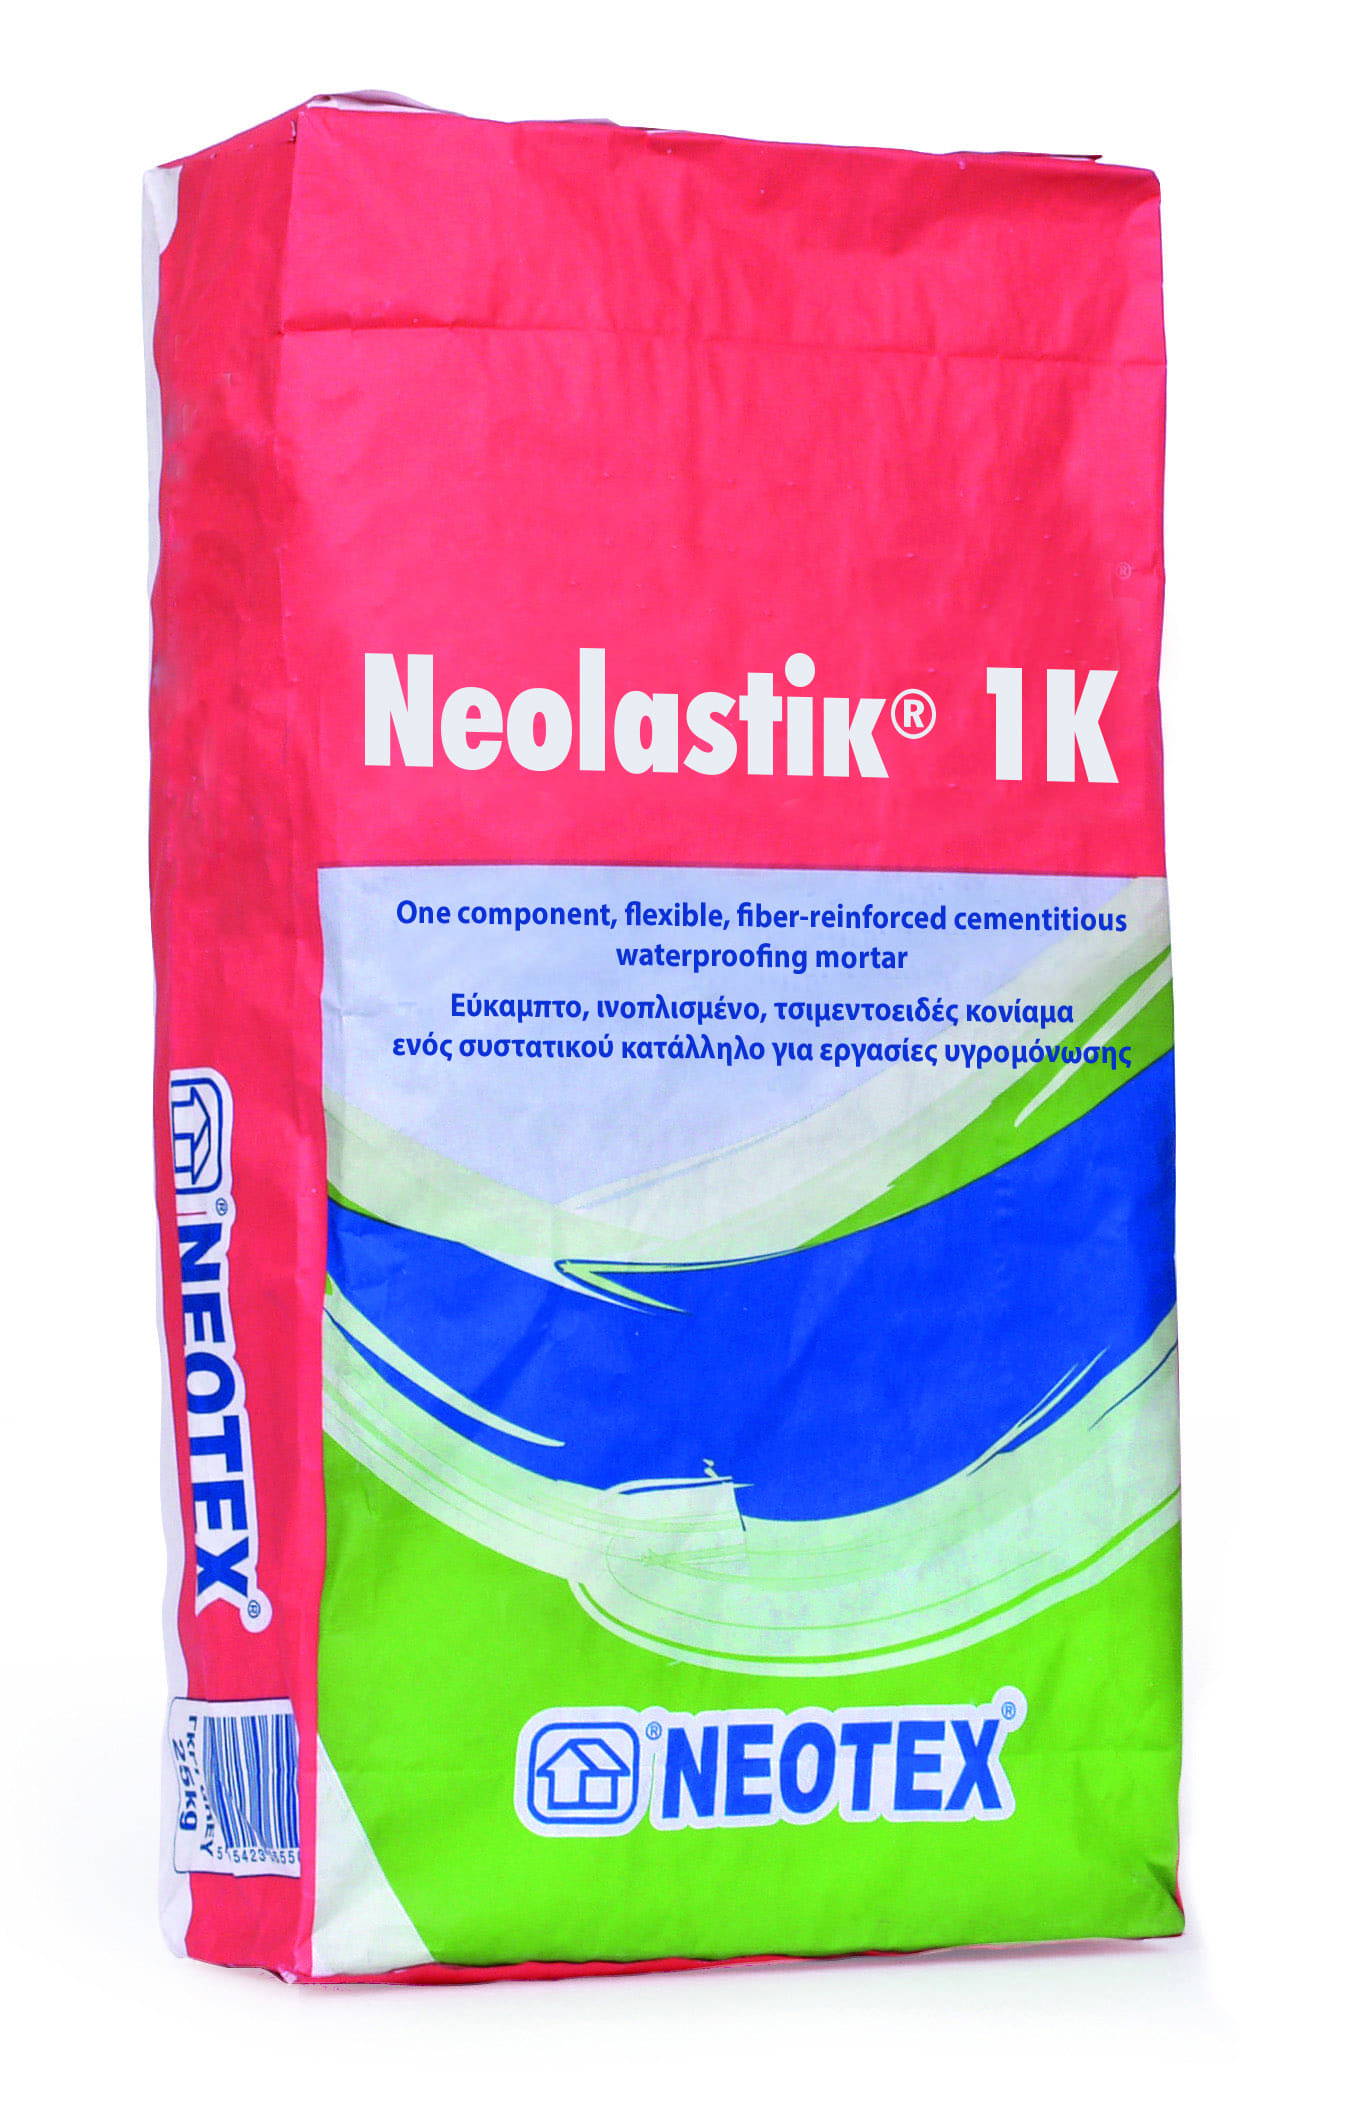 Вяжущий раствор Neolastik 1K